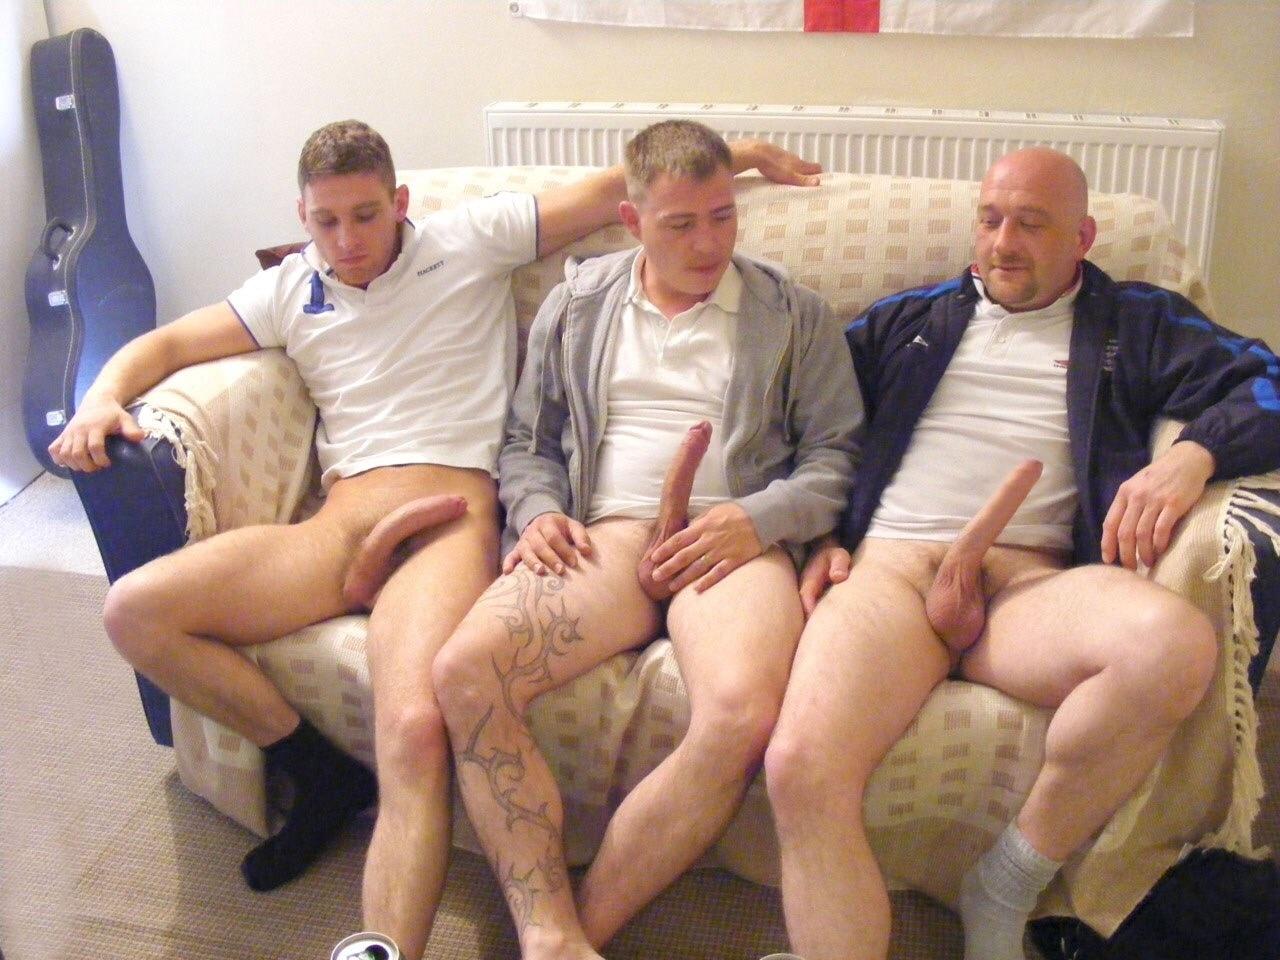 2 older guys teach 2 cute twins 5